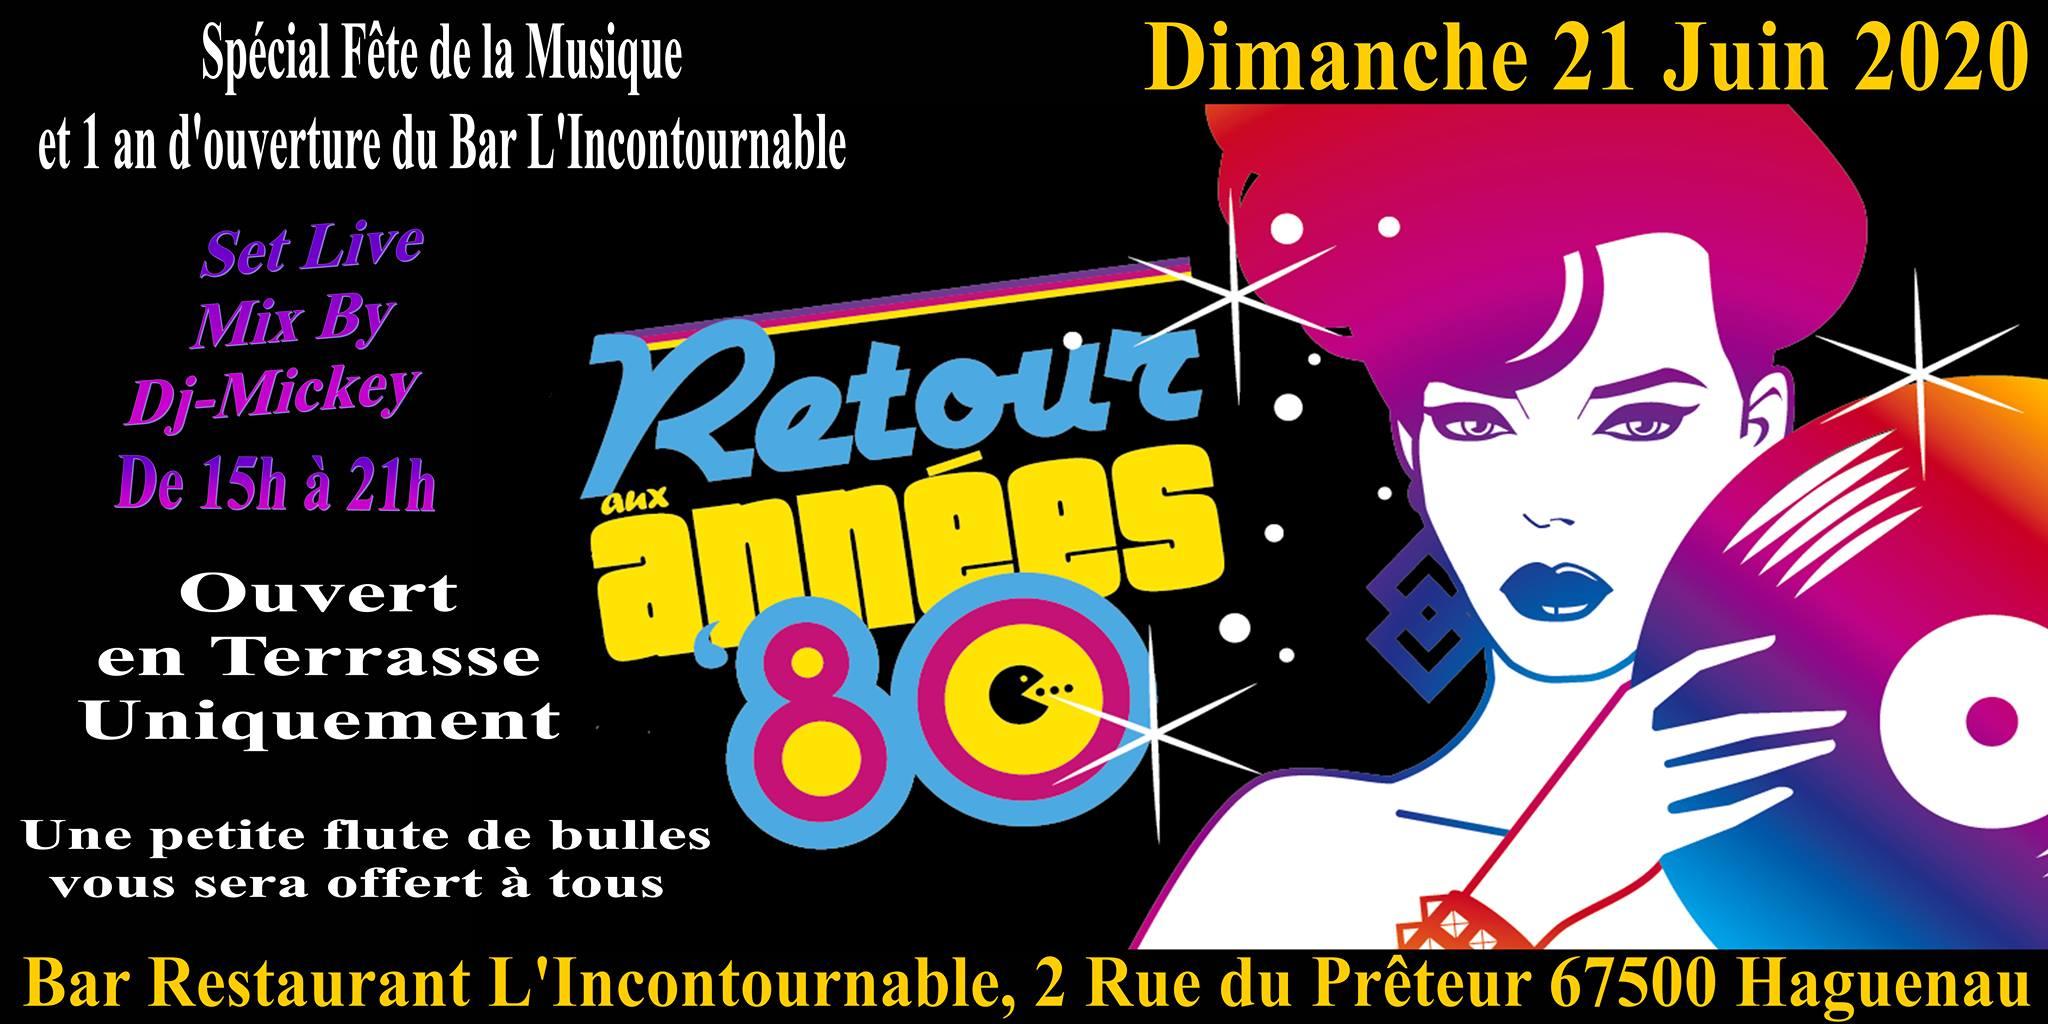 Live Mix Dj-Mickey - Années 80 L'Incontournable